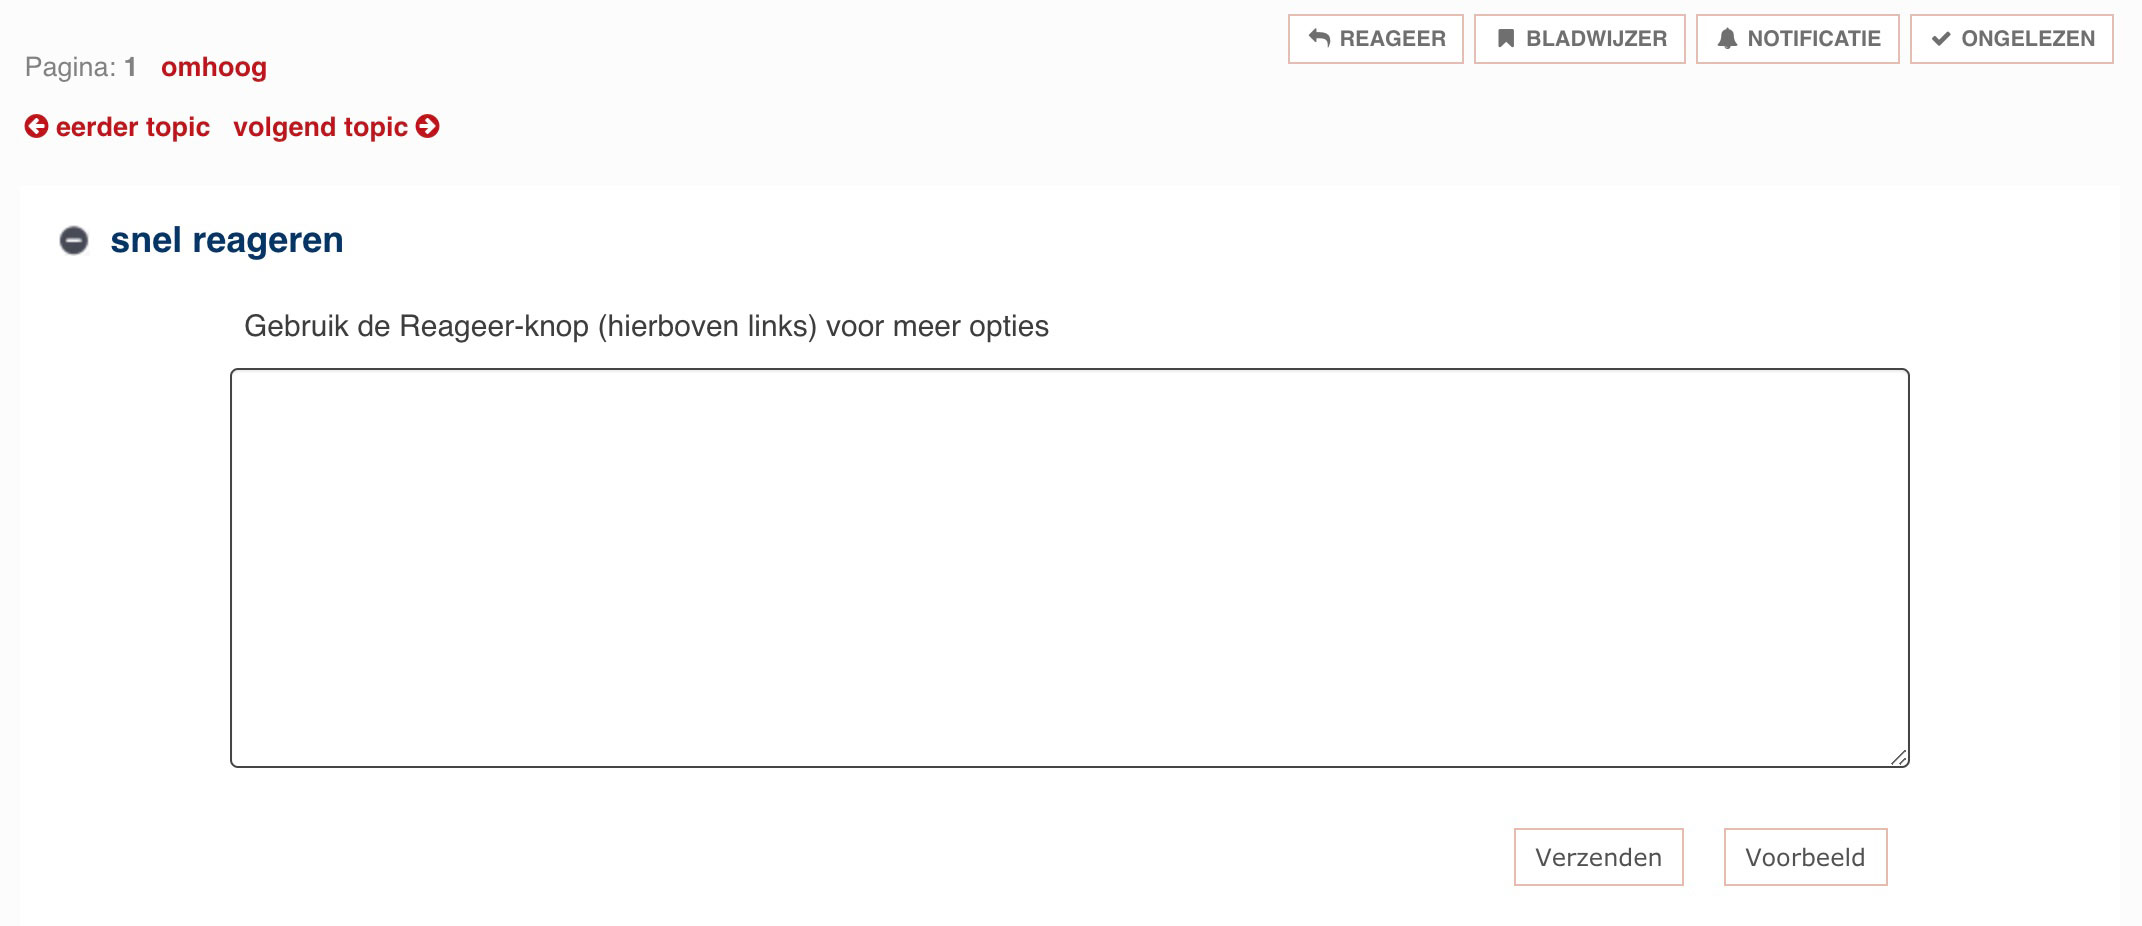 https://www.macfreak.nl/modules/news/images/zArt.UitlegBijlagesPlaatsenMacFreak-1.jpg